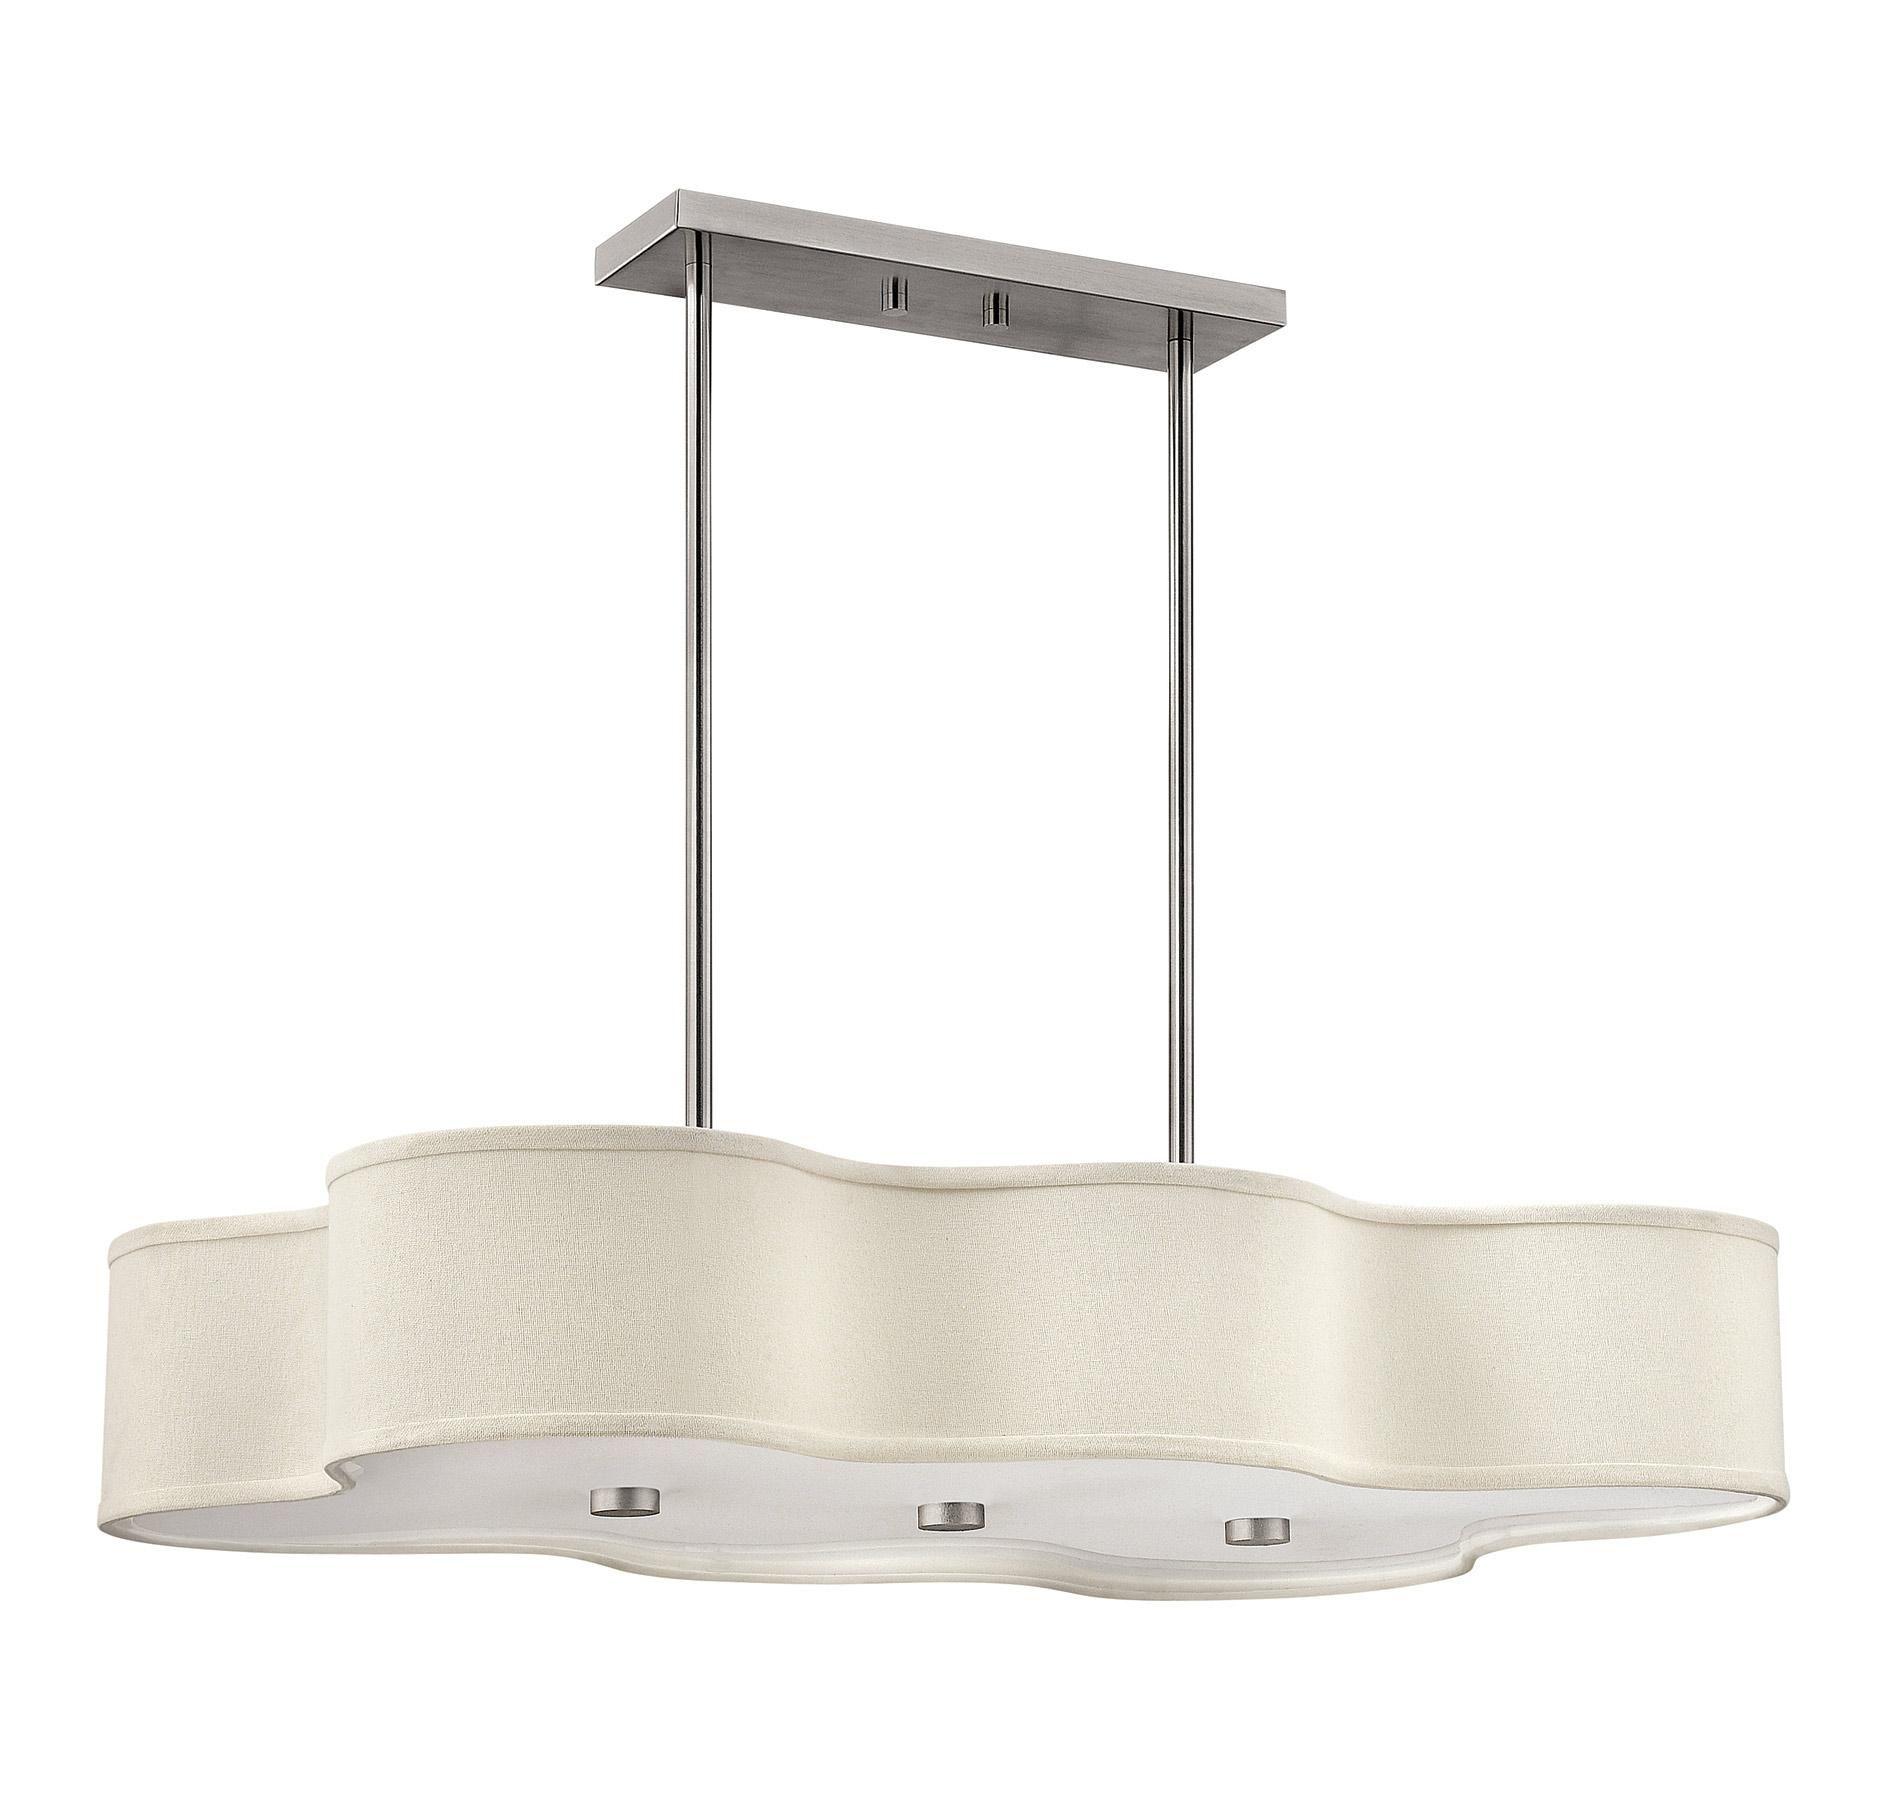 Hinkley 3802bn Cirrus 6 Lt Island Chandelier In Ceiling Lights Kitchen Island Lights Prog Outdoor Light Fixtures Chandelier Lighting Kitchen Pendant Lighting